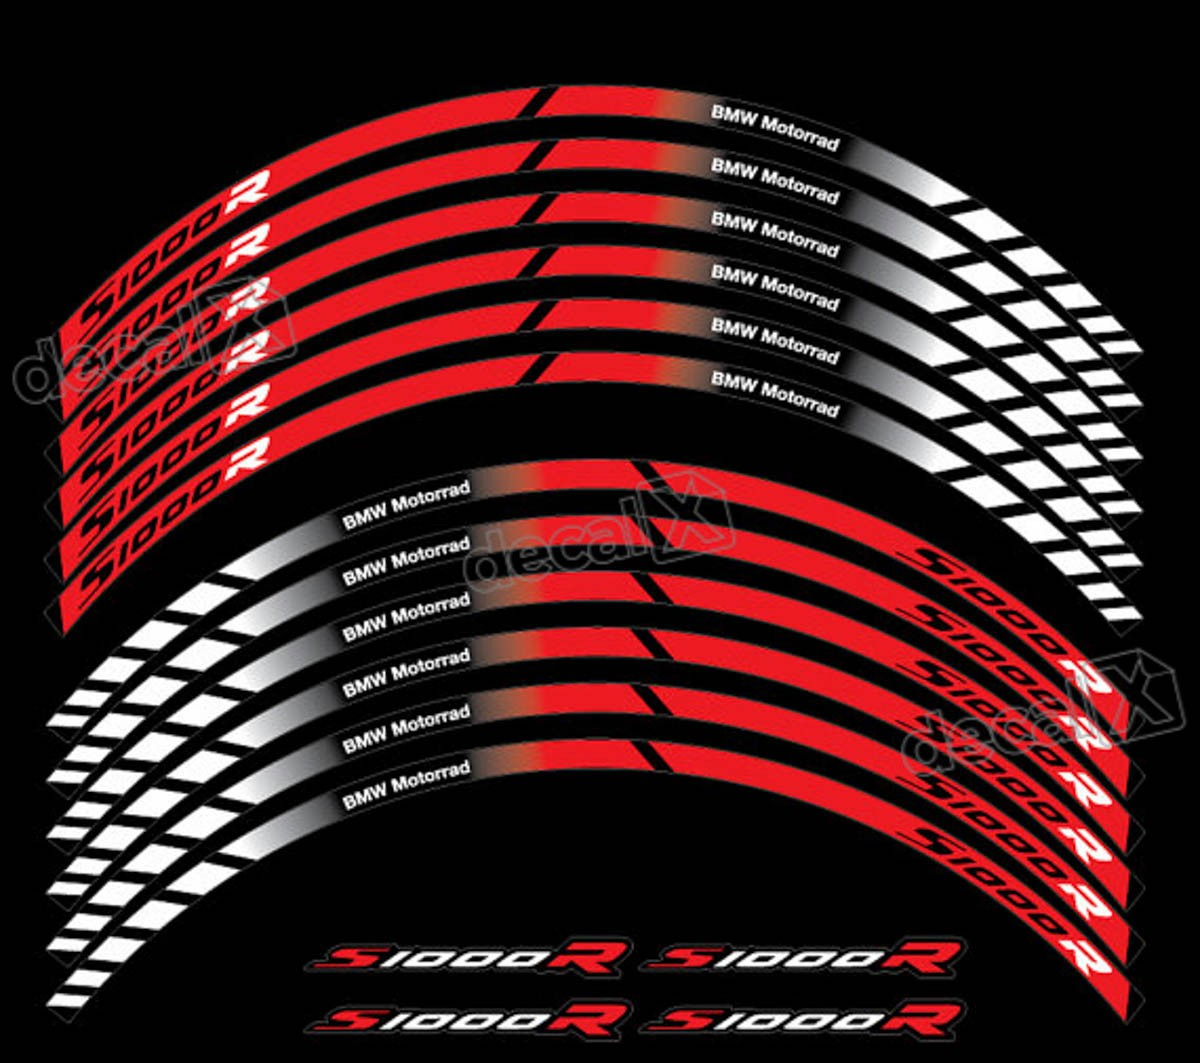 Kit Adesivos Friso Refletivo Roda Moto Bmw S1000r Fri032